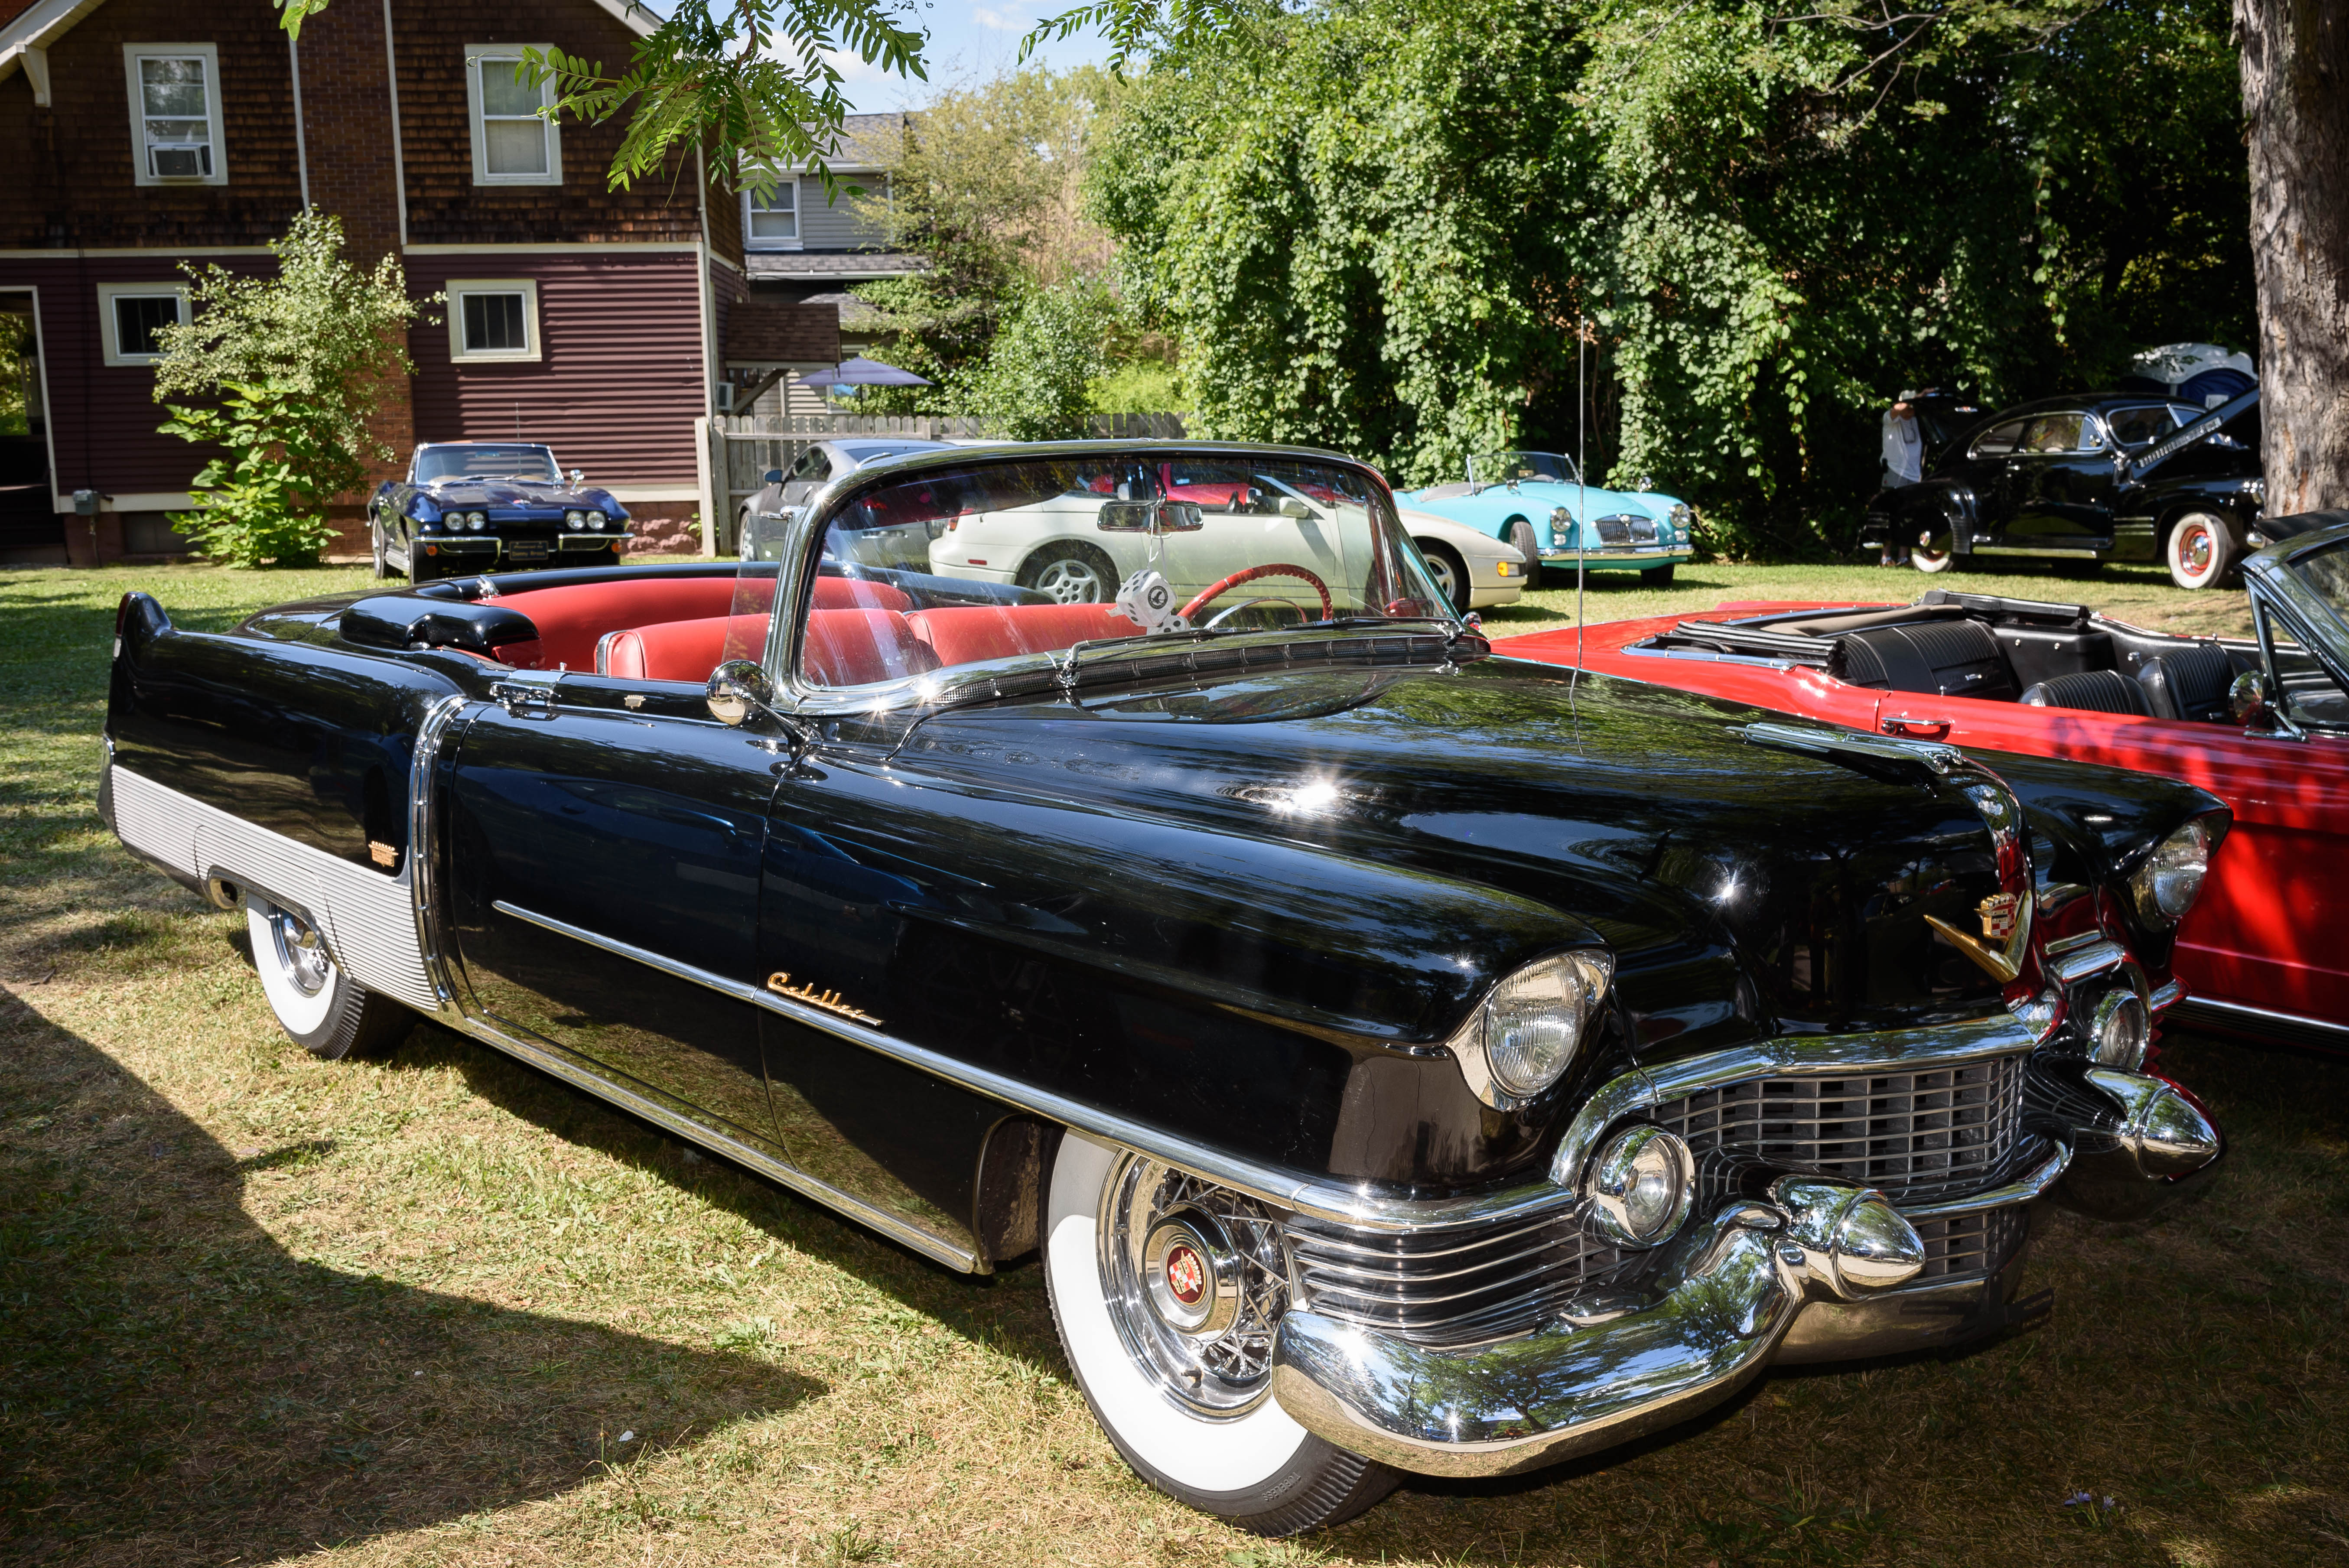 1954 Cadillac Eldorado Convertible, 2015, Nikon, Vehicle, Us, HQ Photo